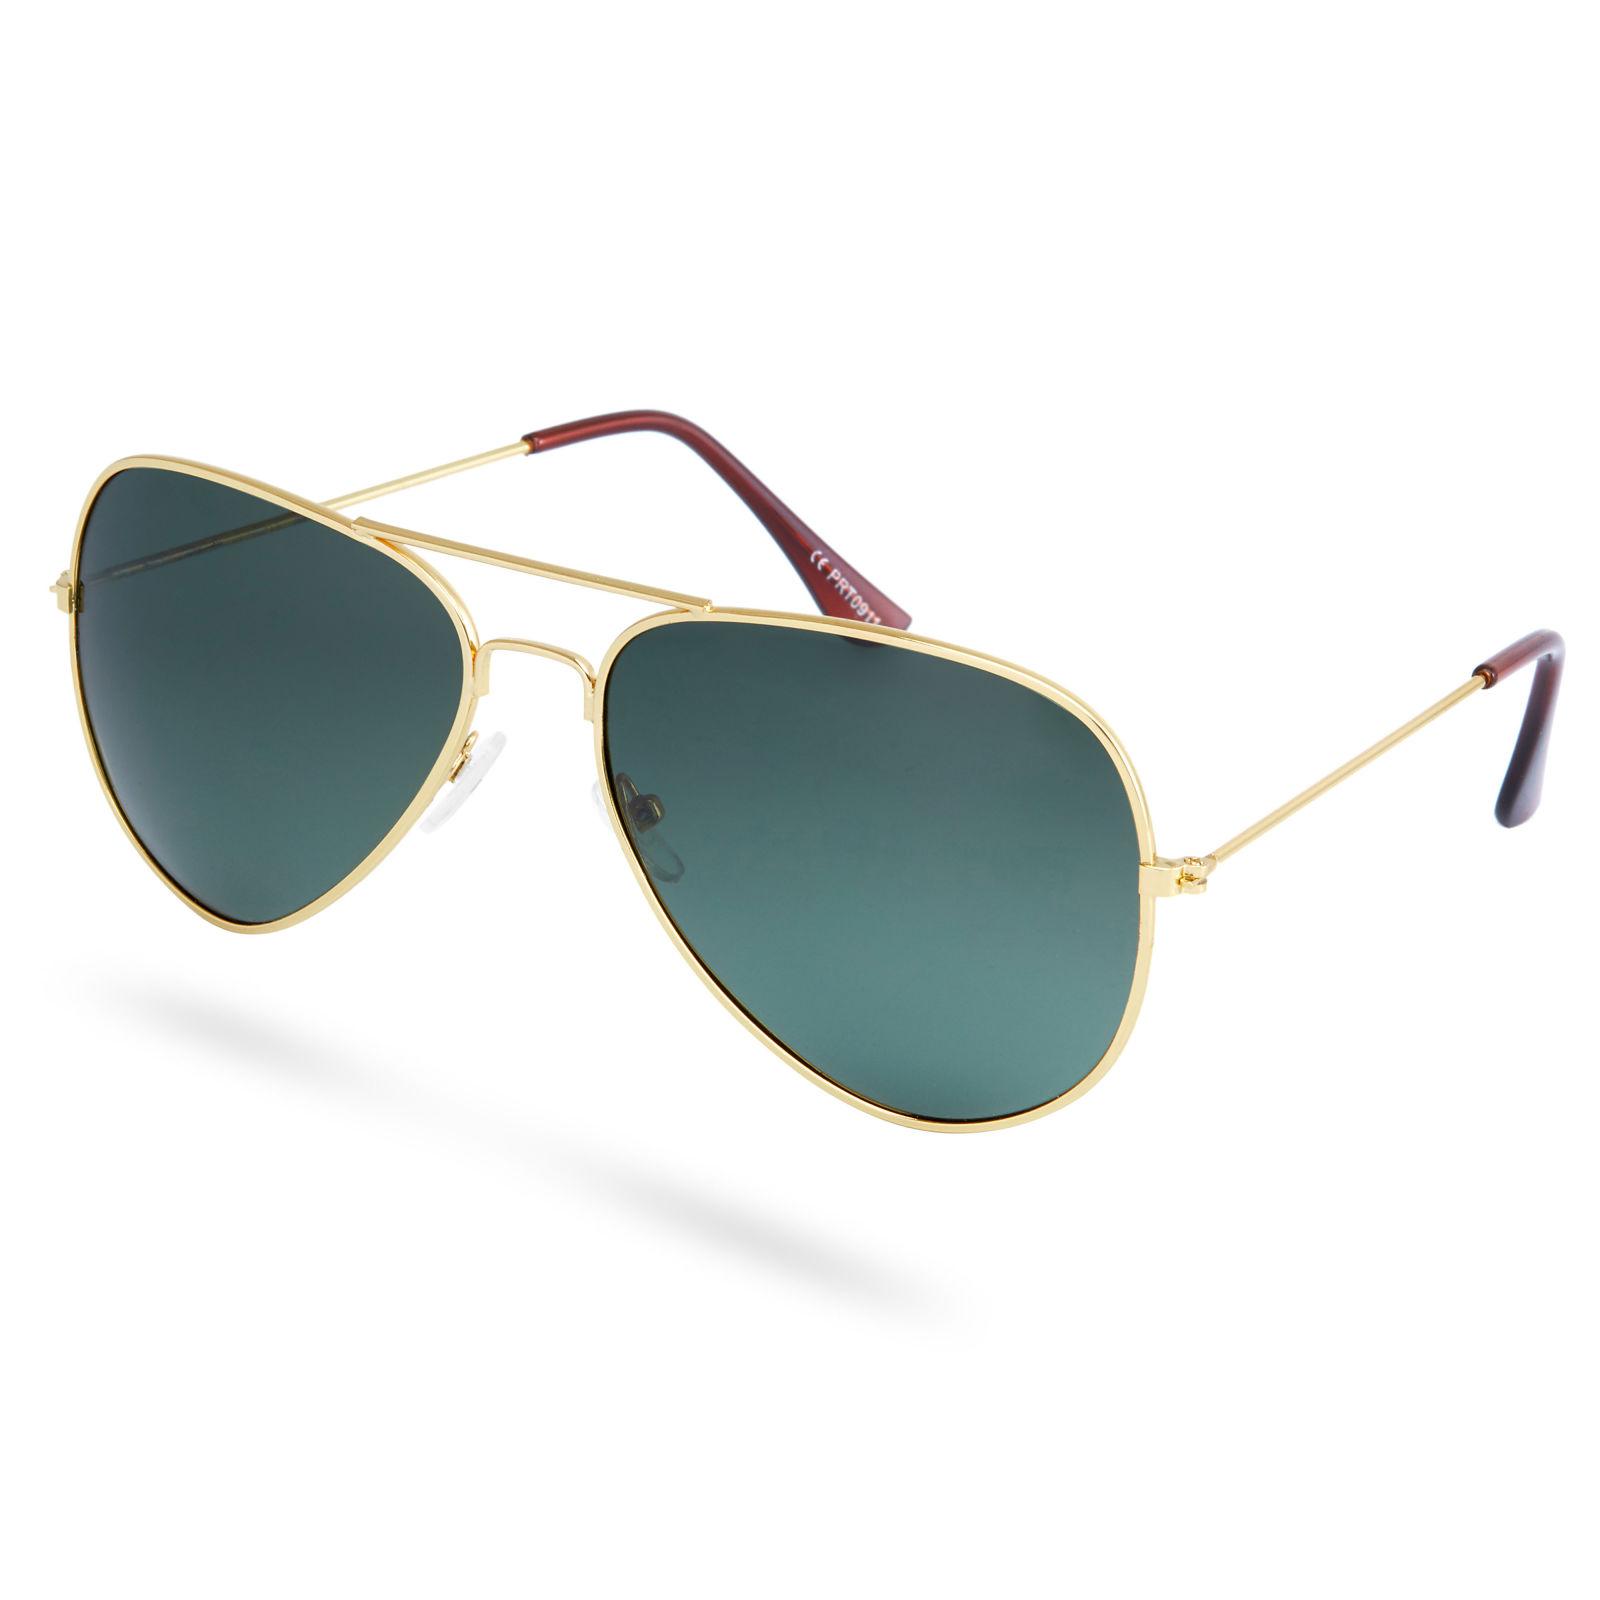 b373ab5a52b9 Guld   Mørkegrønne Polariserede Aviator Solbriller